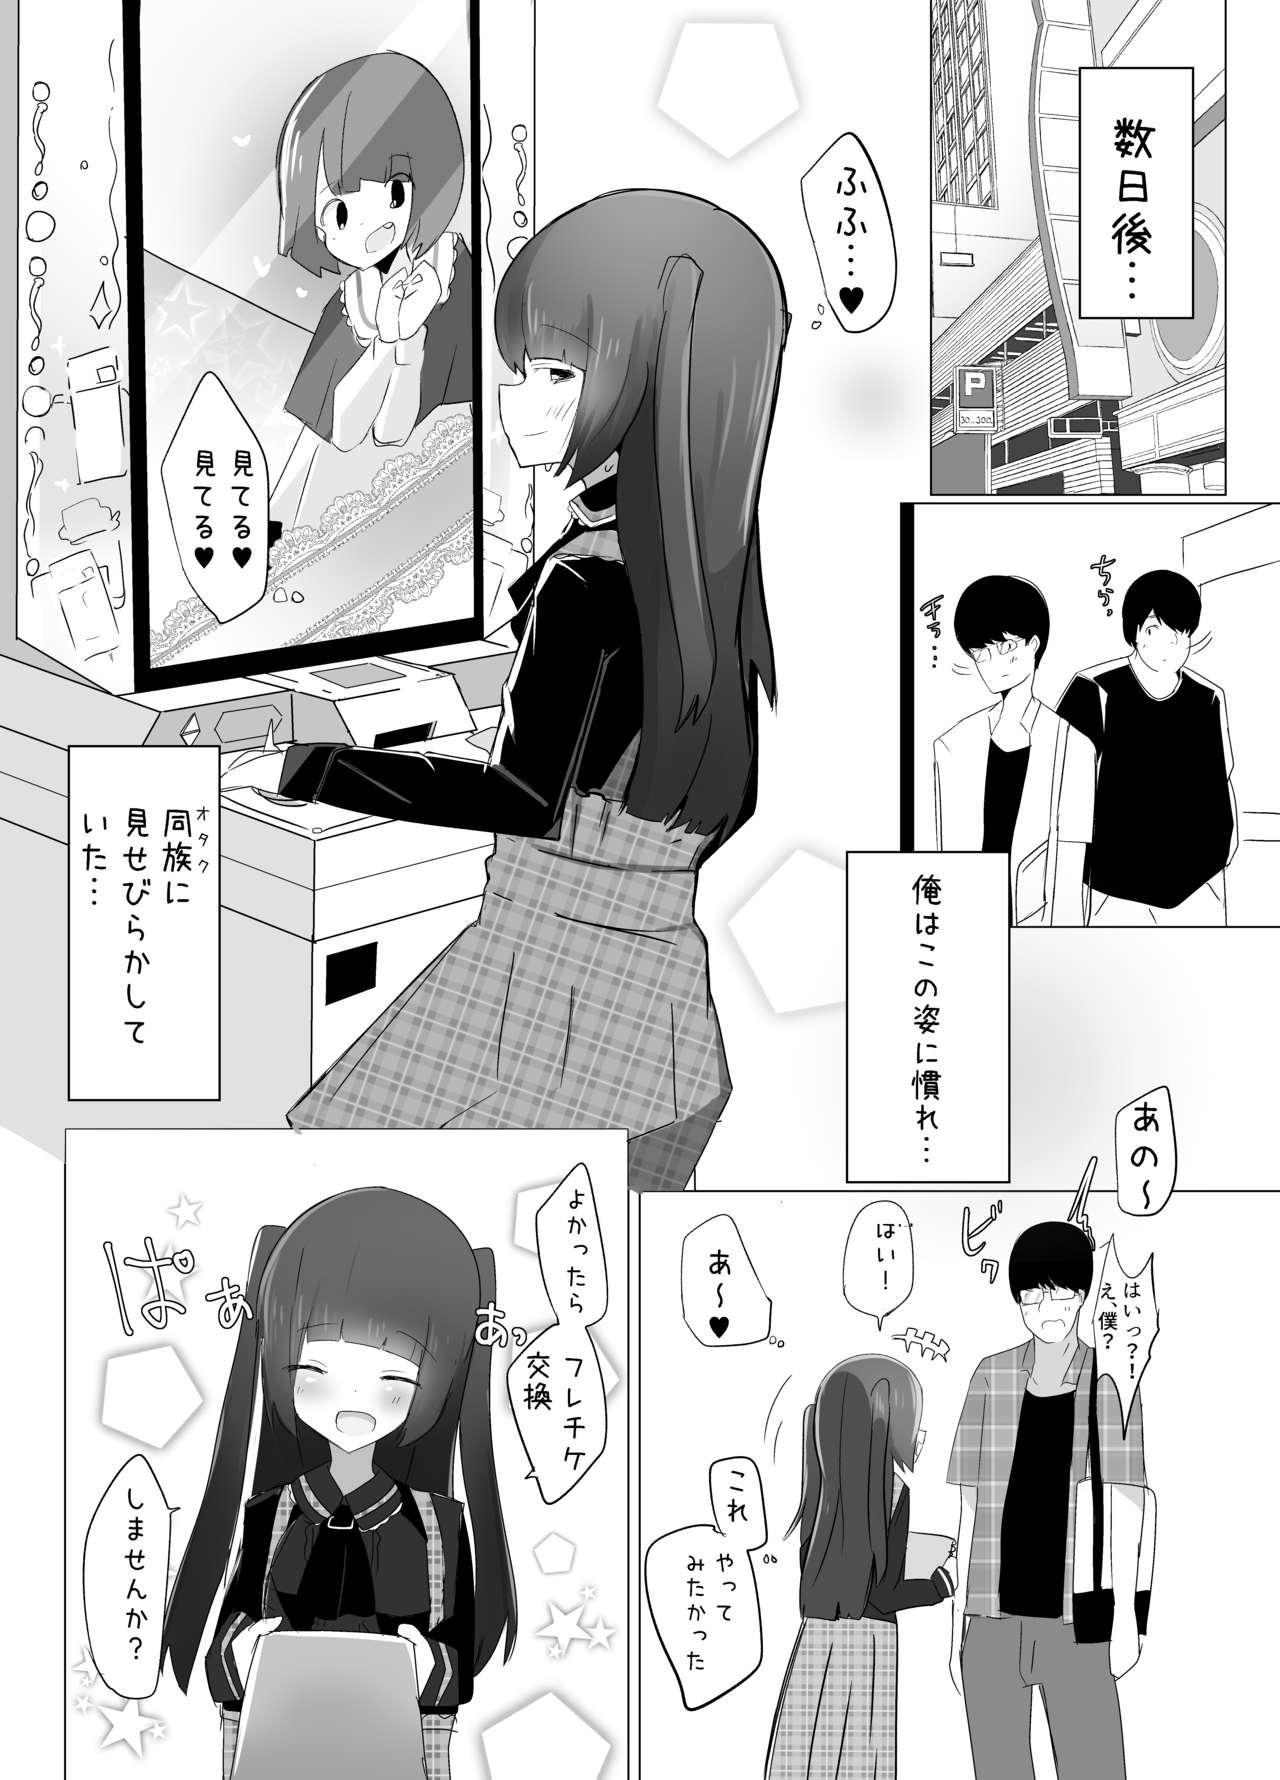 TS Hime wa Okasaretai. 2